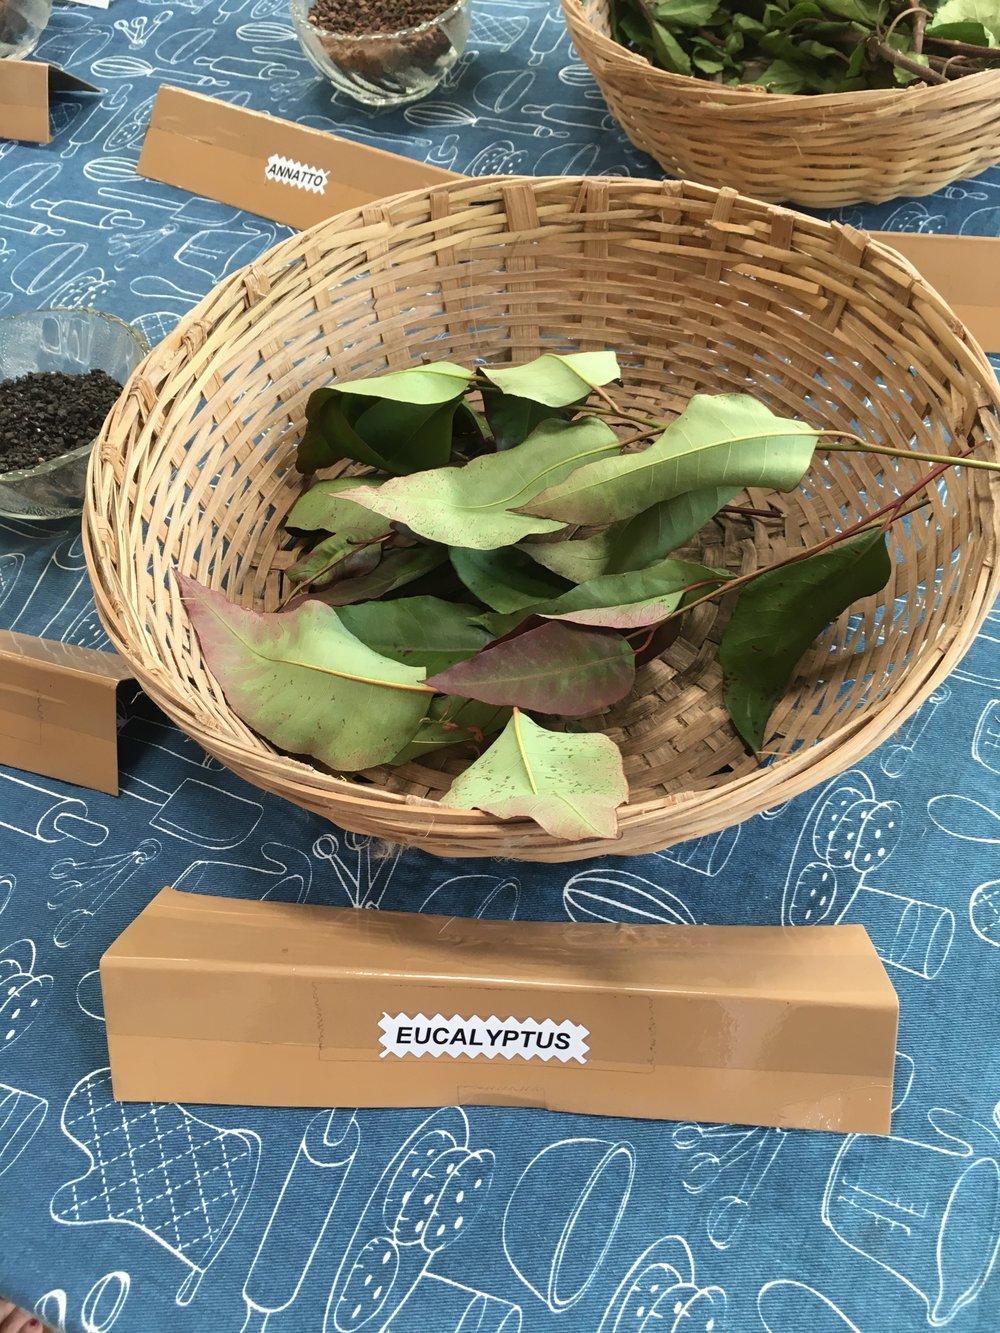 Eucalyptus leaves produce a gray dye